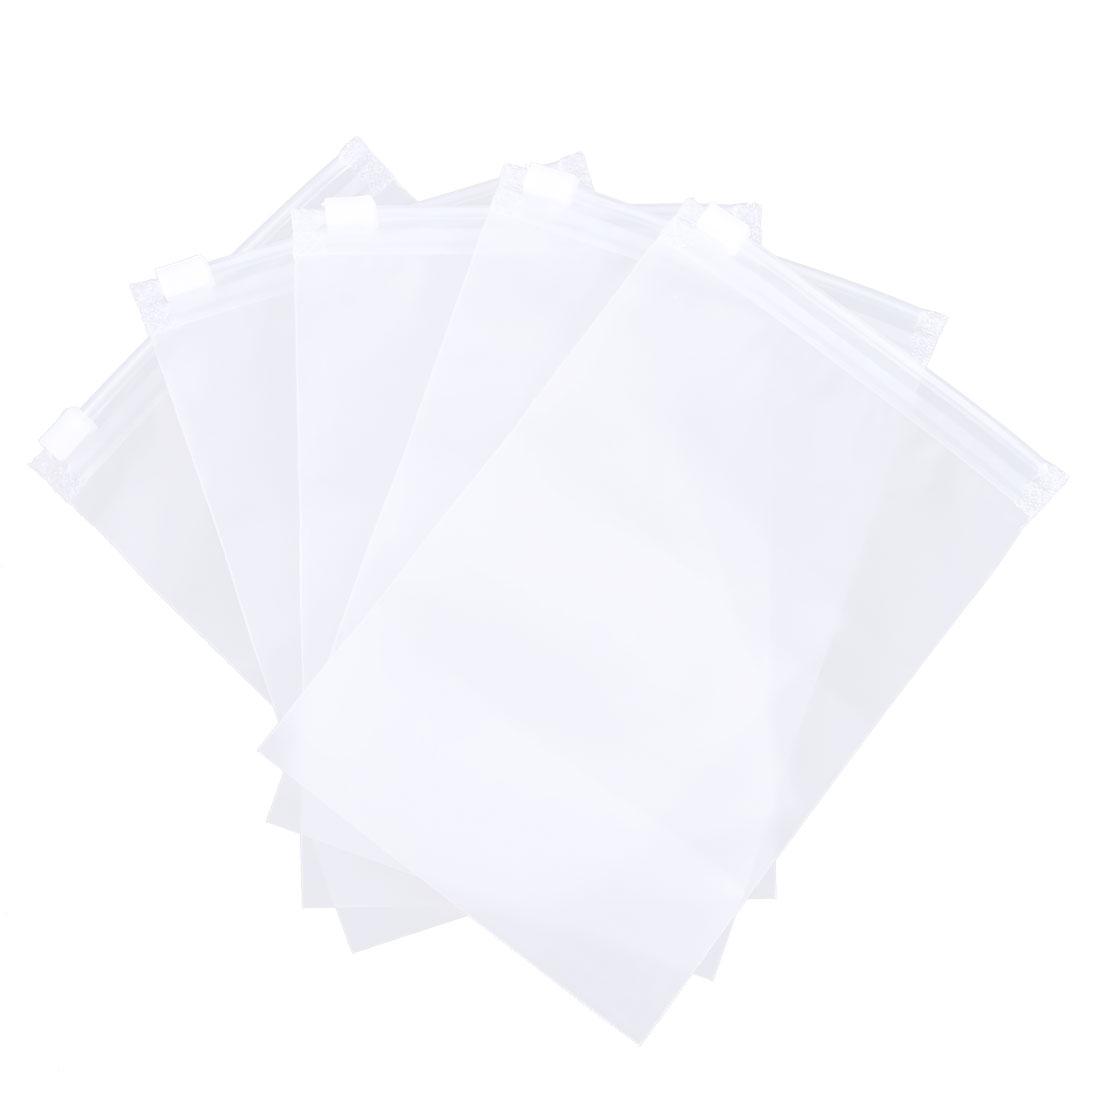 Travel Hiking PVC Transparent Water Resistance Clothes Seal Storage Bag 5pcs